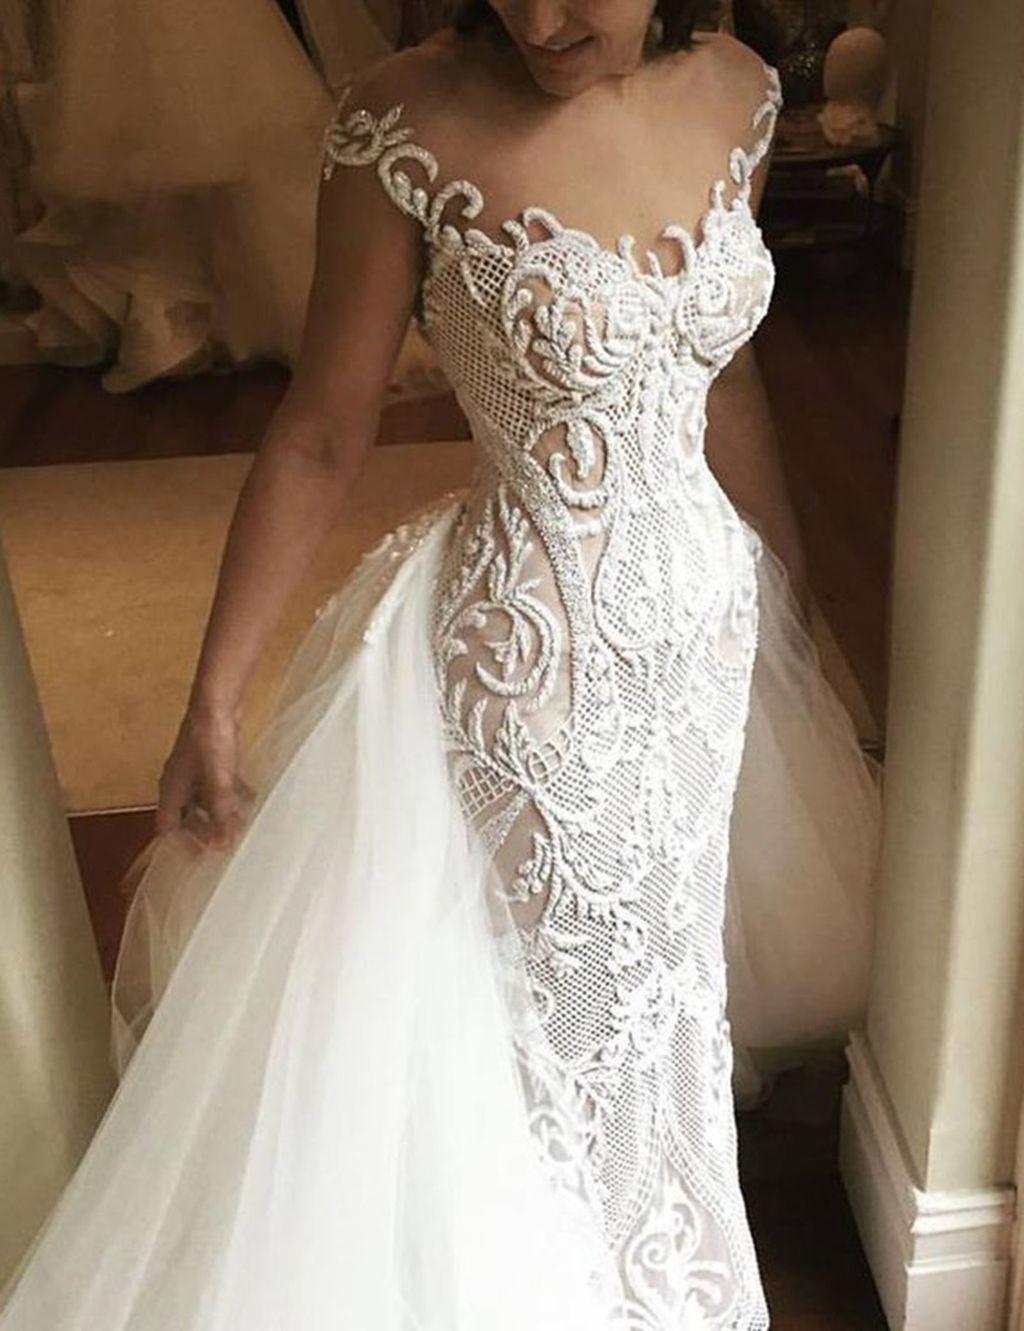 c9e041b190c1 Buy Wedding Dress, Wedding Dresses Plus Size, Wedding Dresses 2018, Vintage  Country Weddings